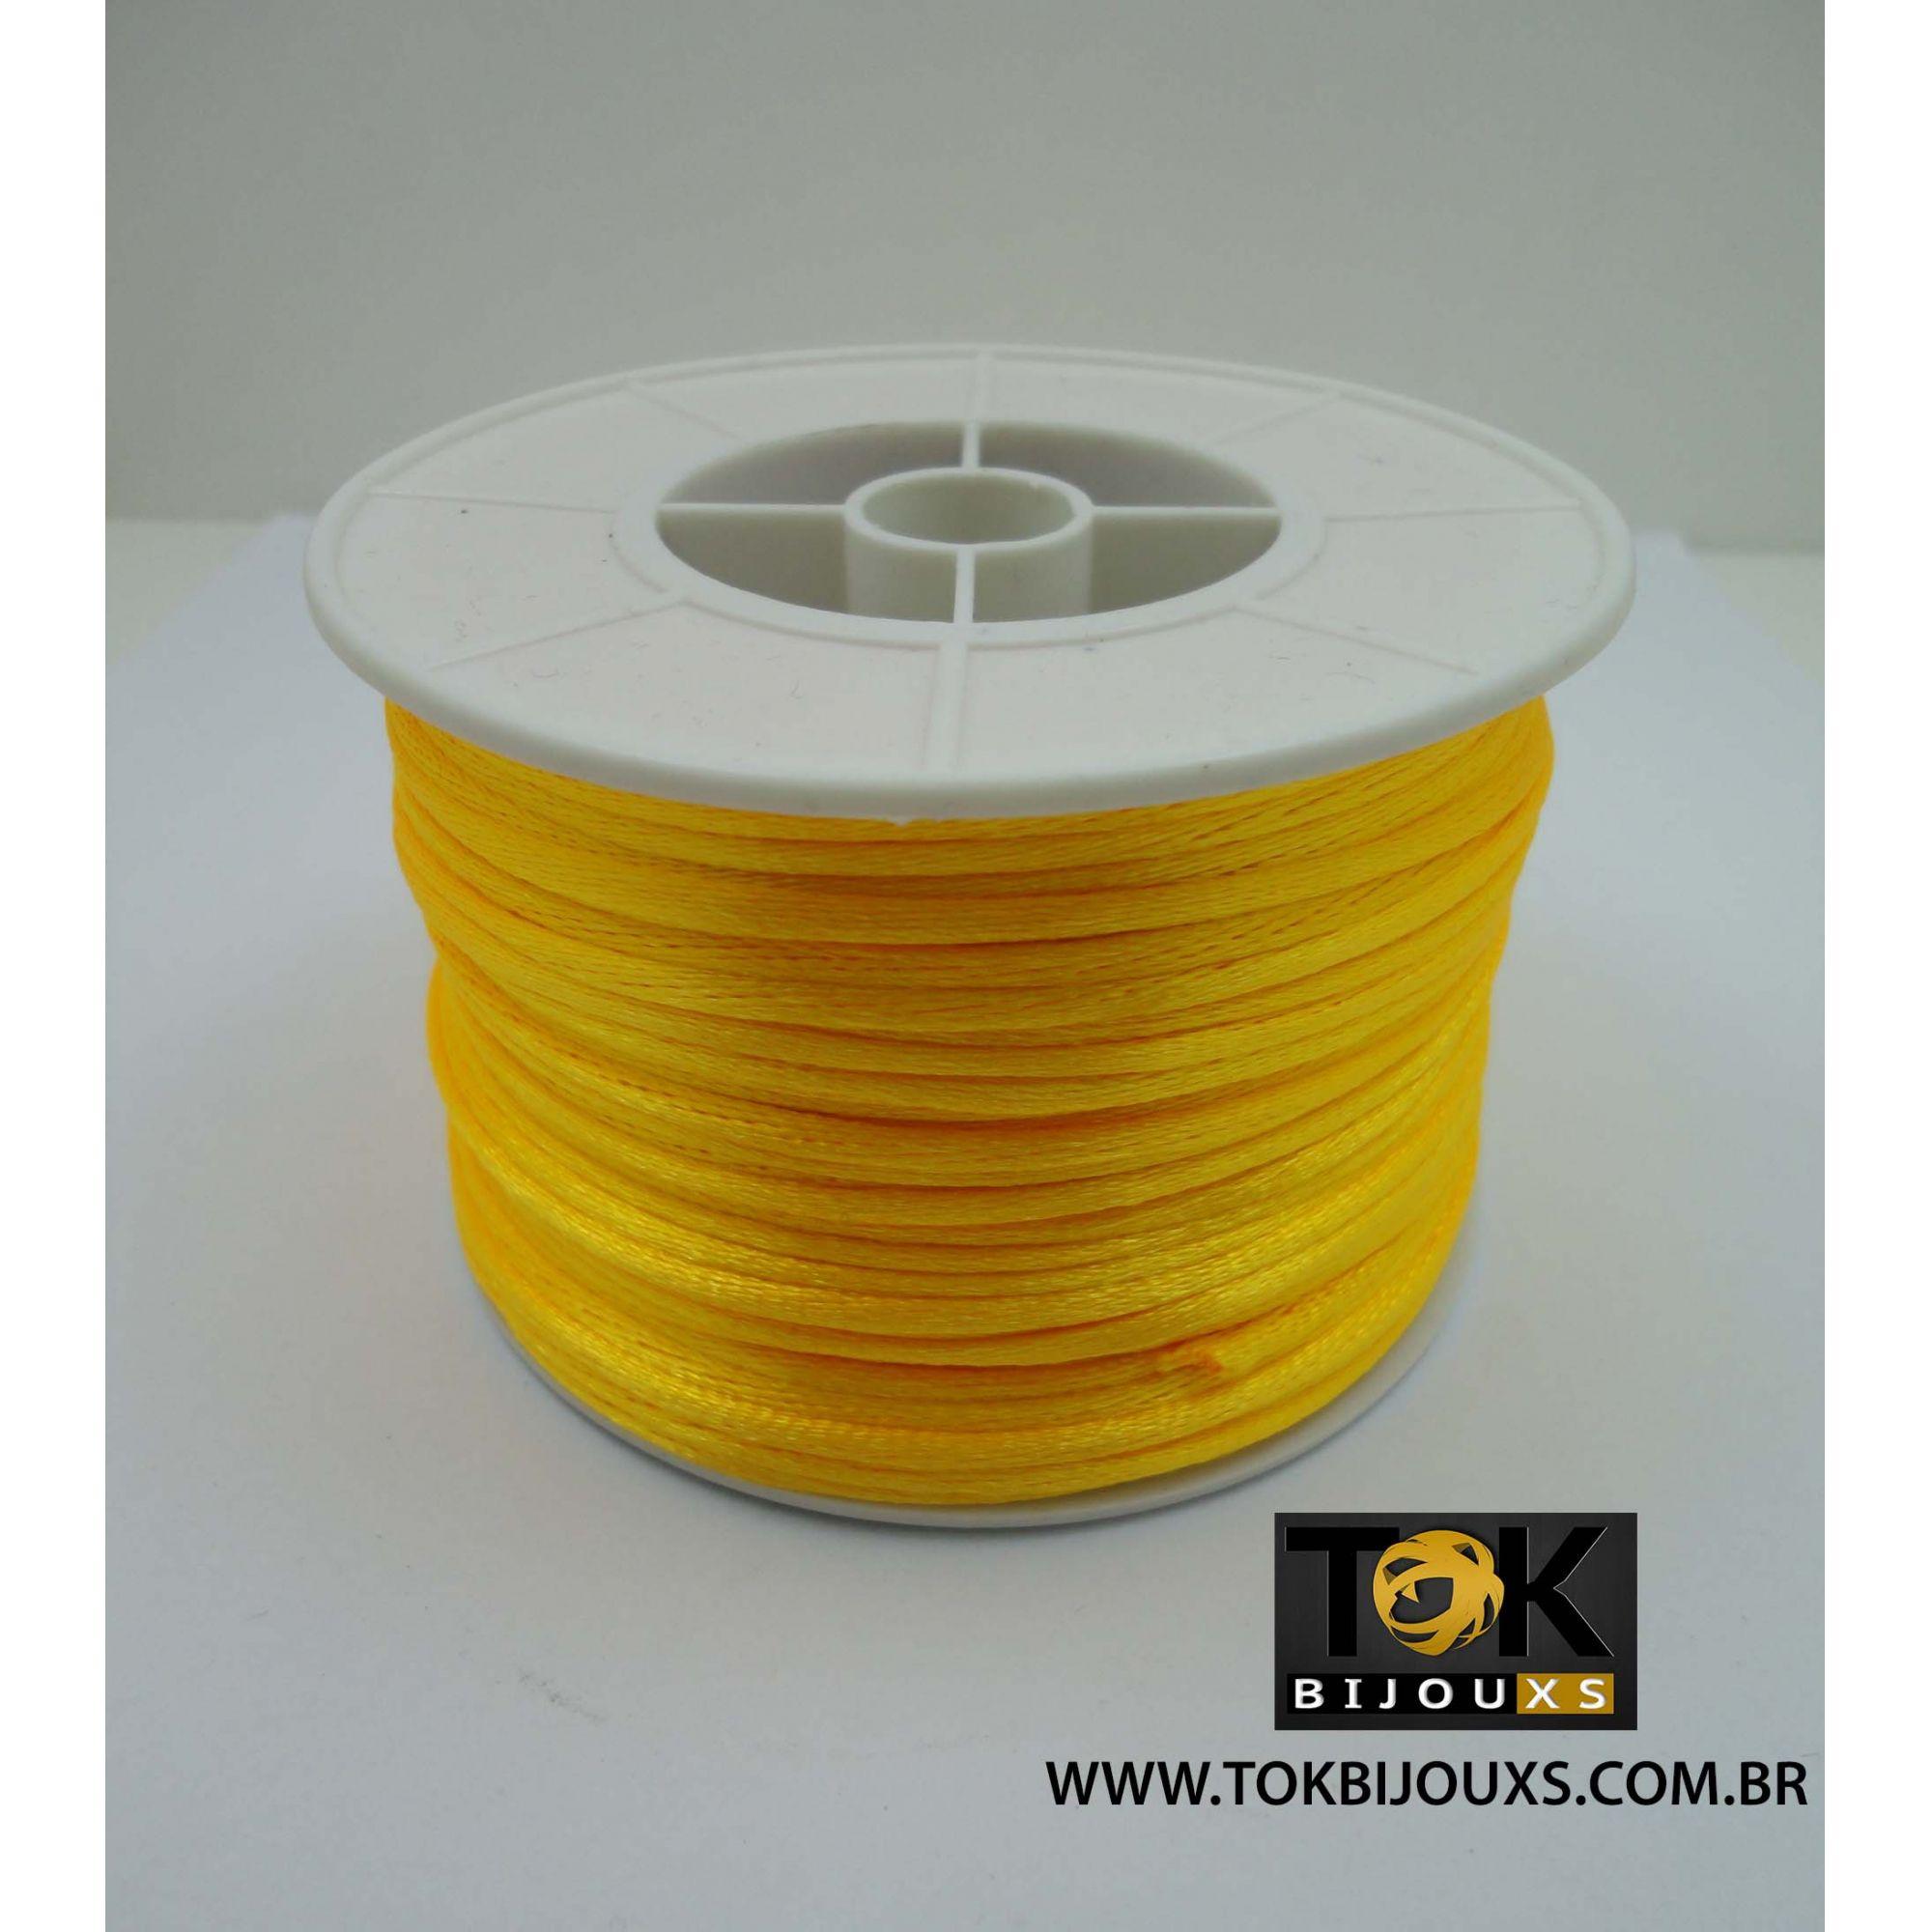 Cordão De Seda Acetinado - Rolo 50 Metros - Amarelo Ouro